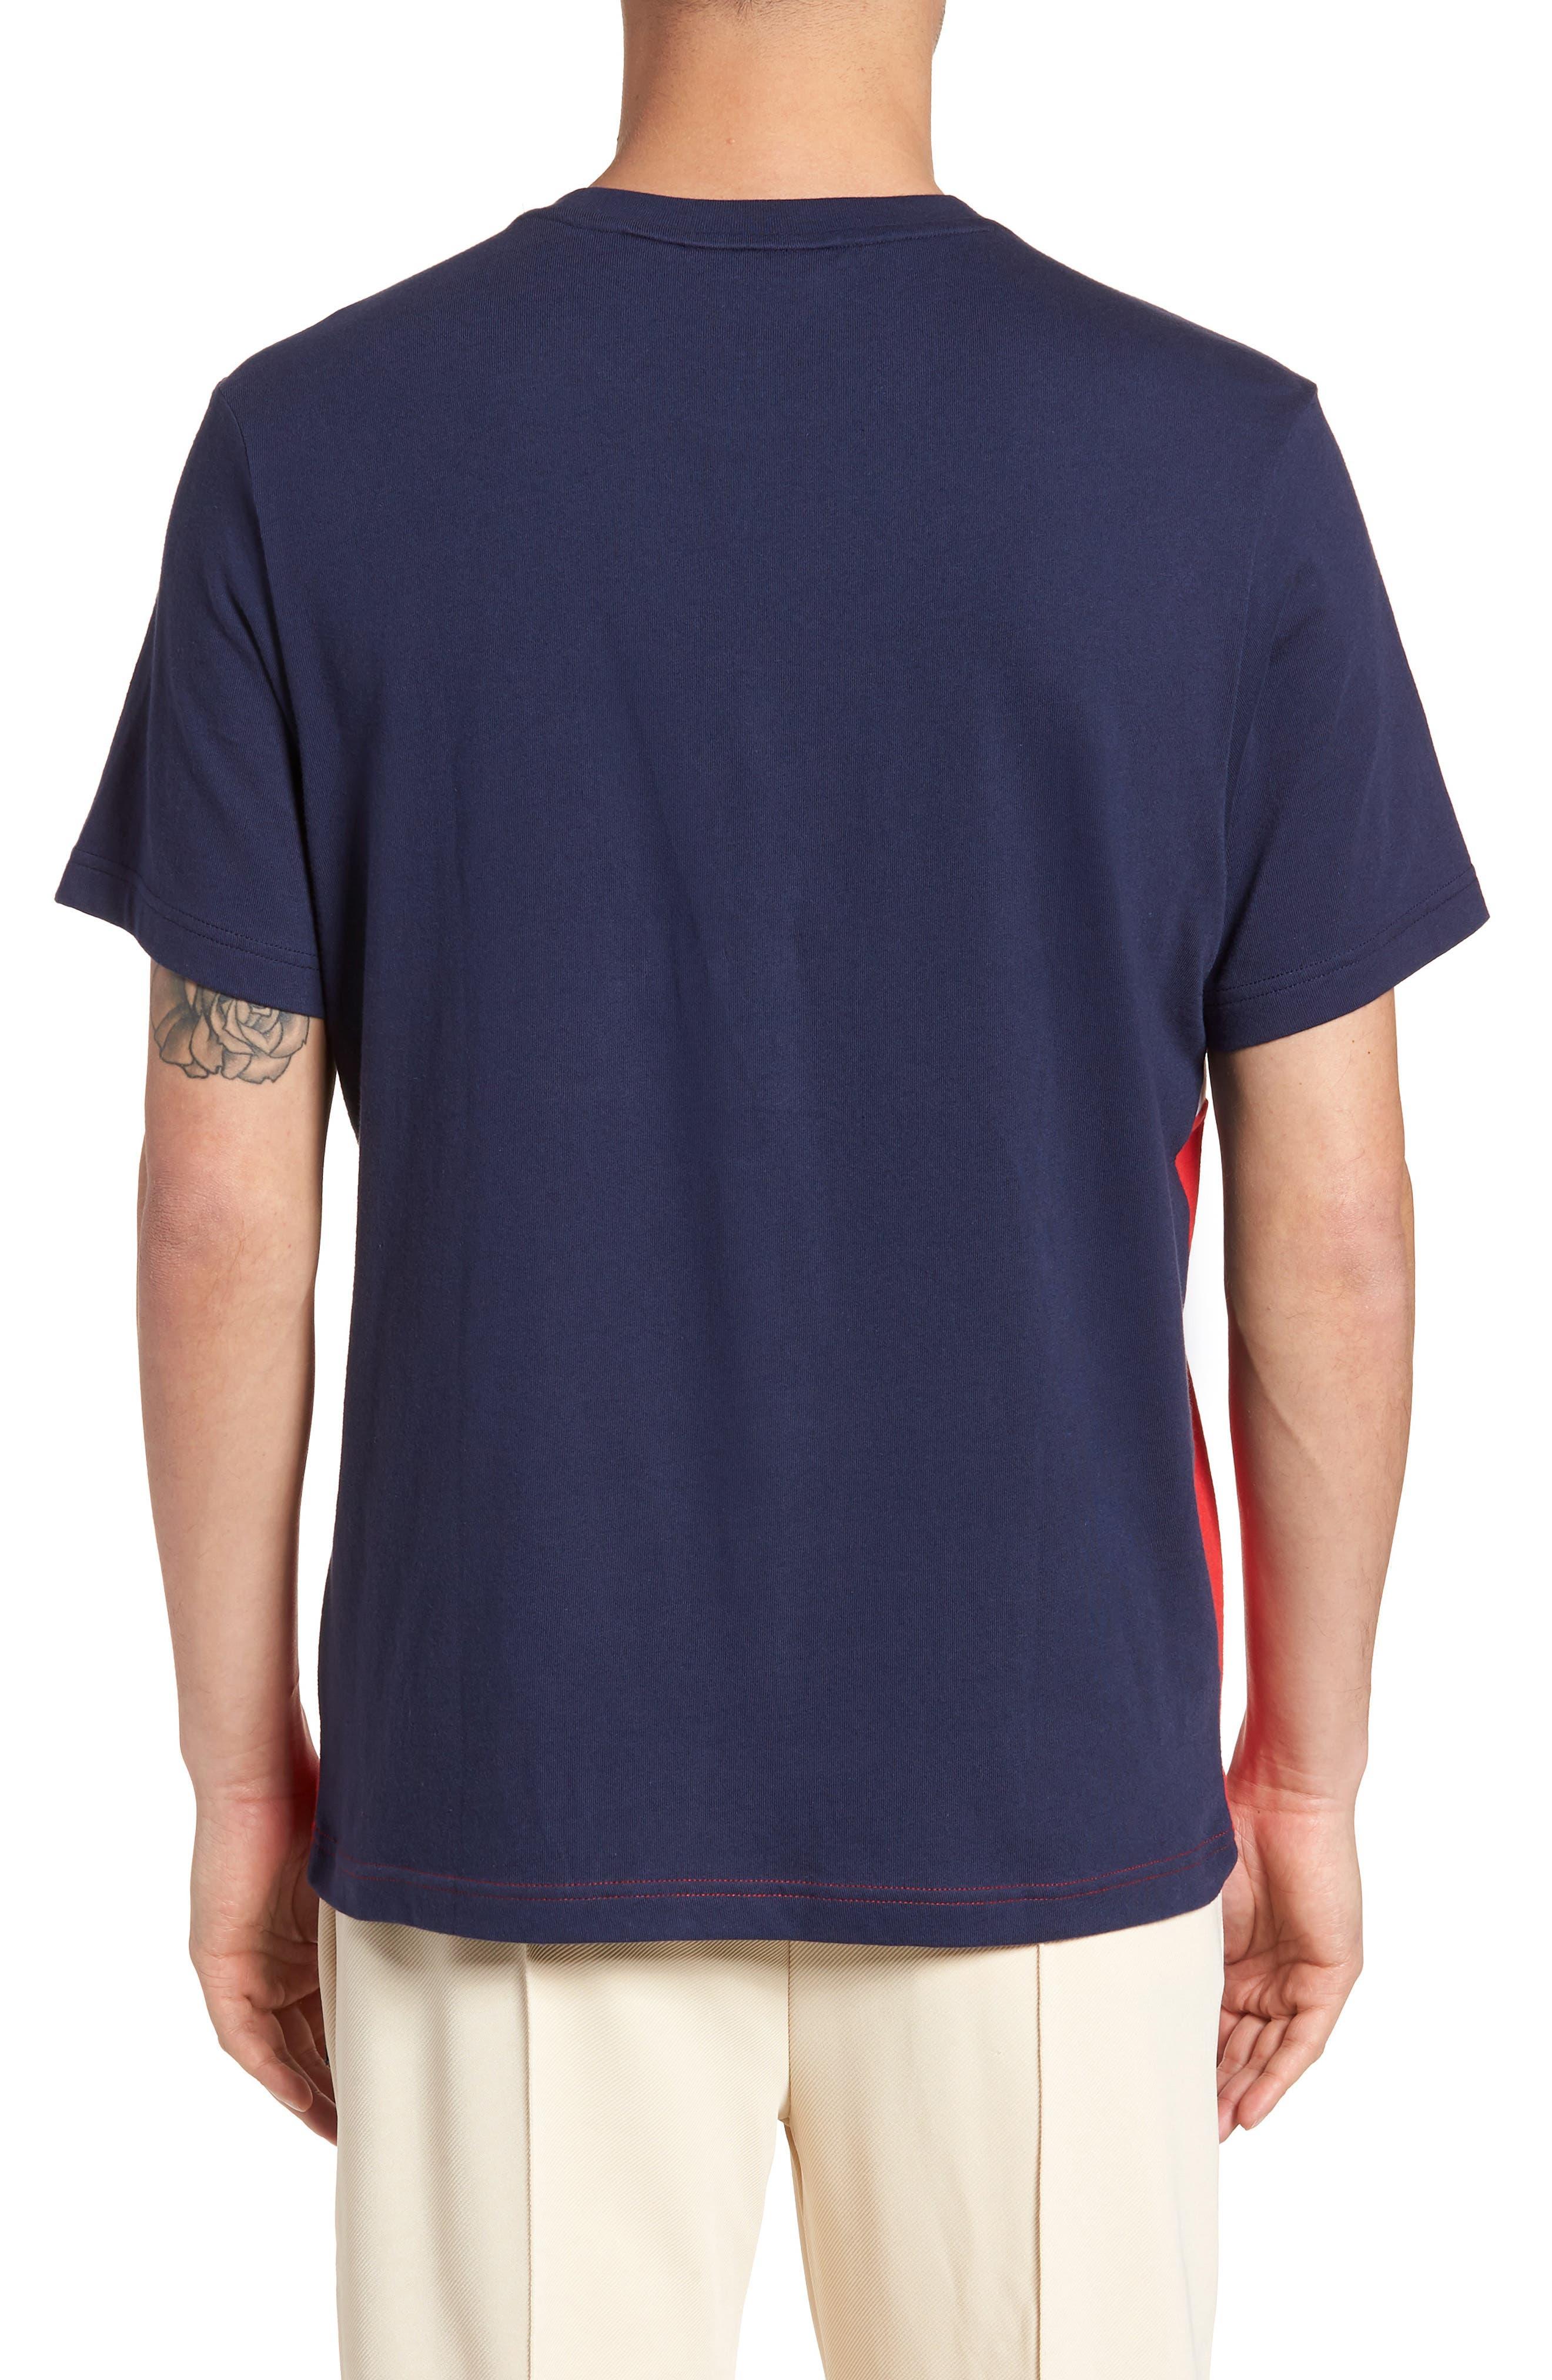 Biella Italia T-Shirt,                             Alternate thumbnail 2, color,                             Navy/ White/ Red